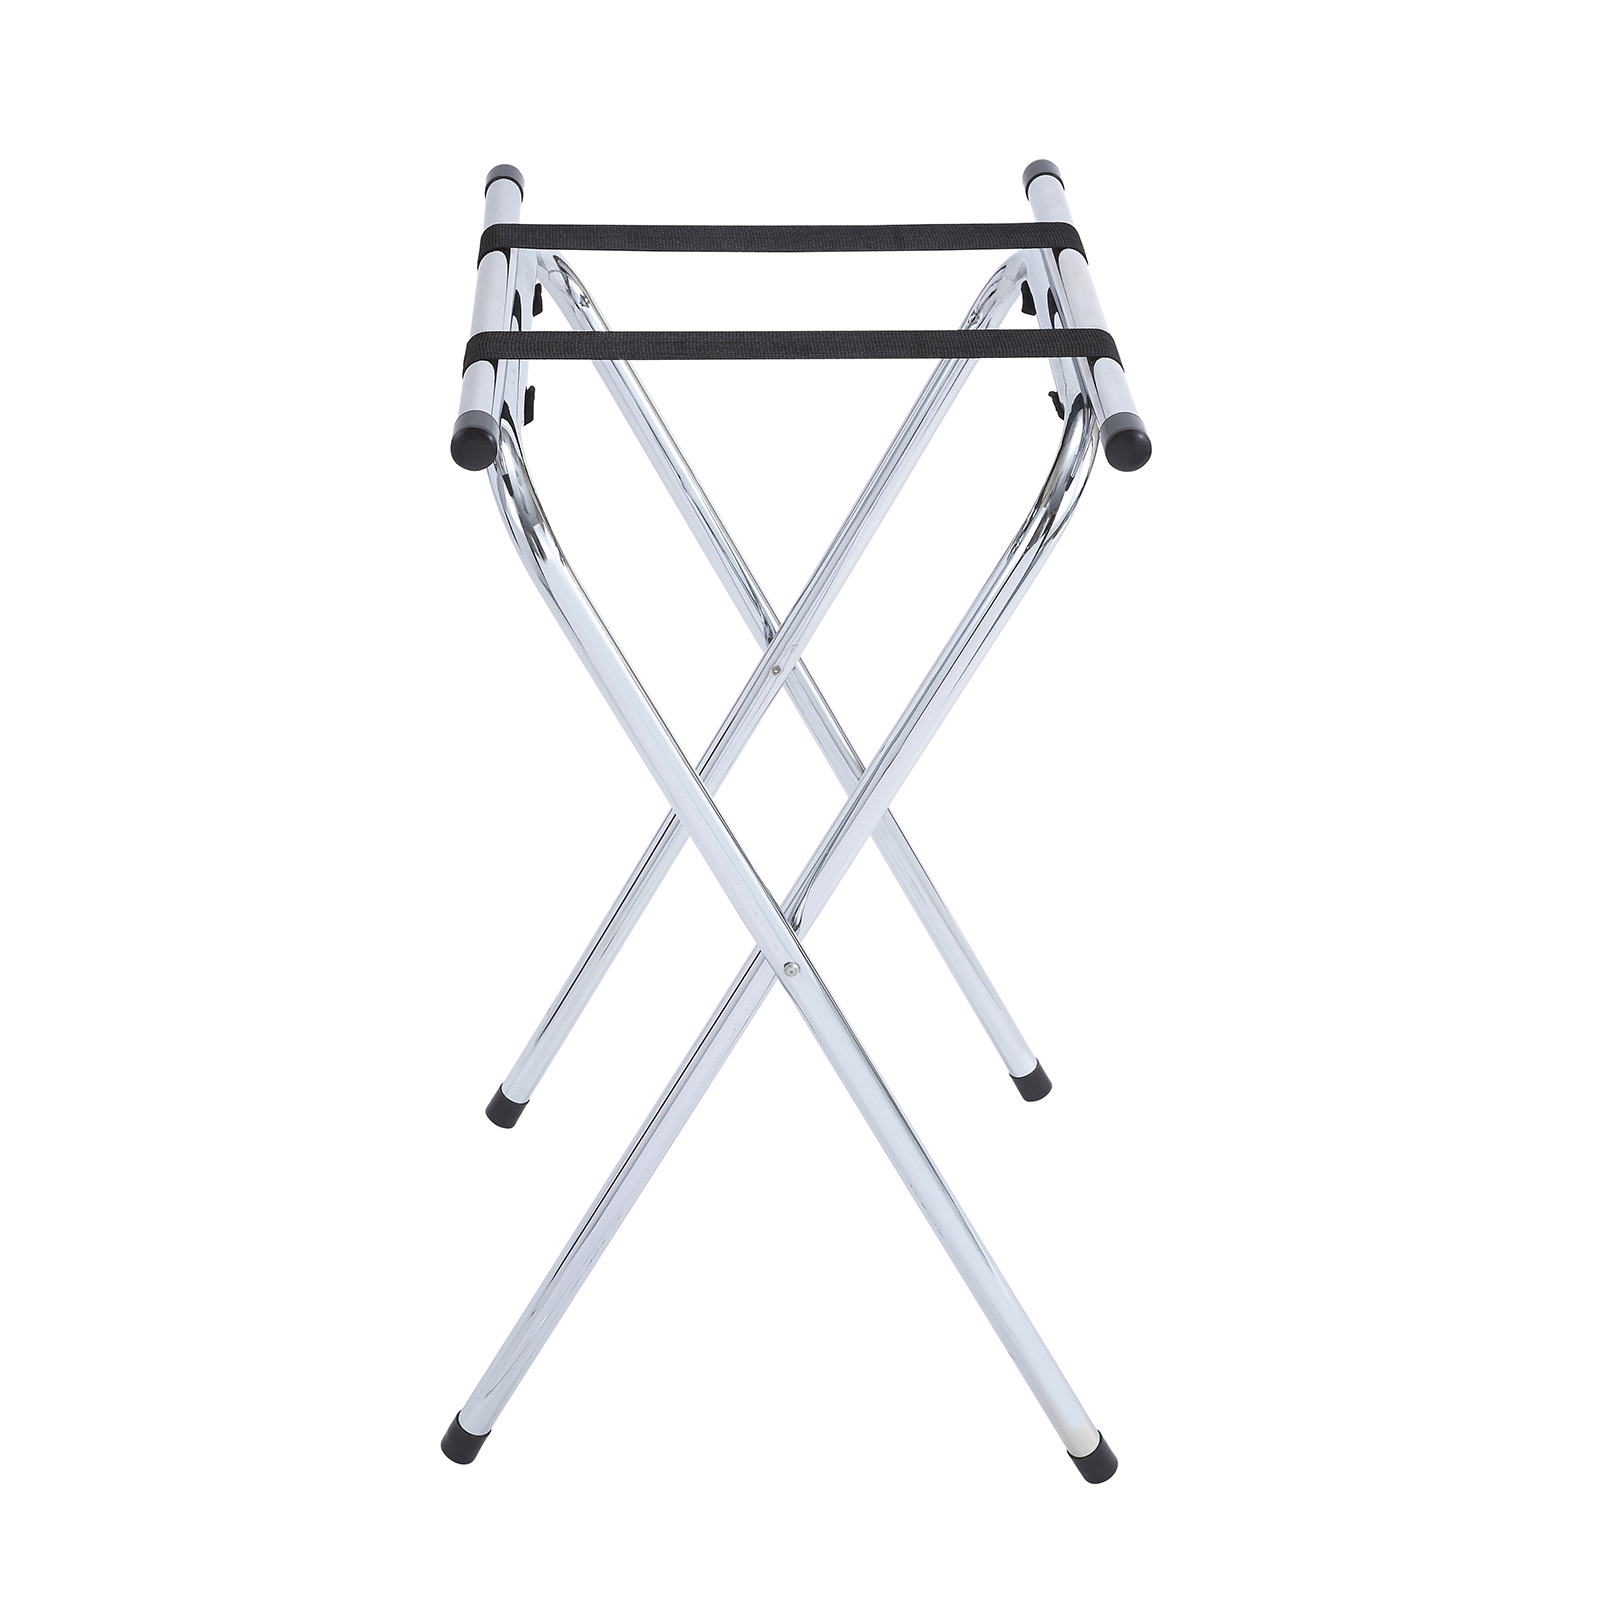 Winco TSY-1A tray stand